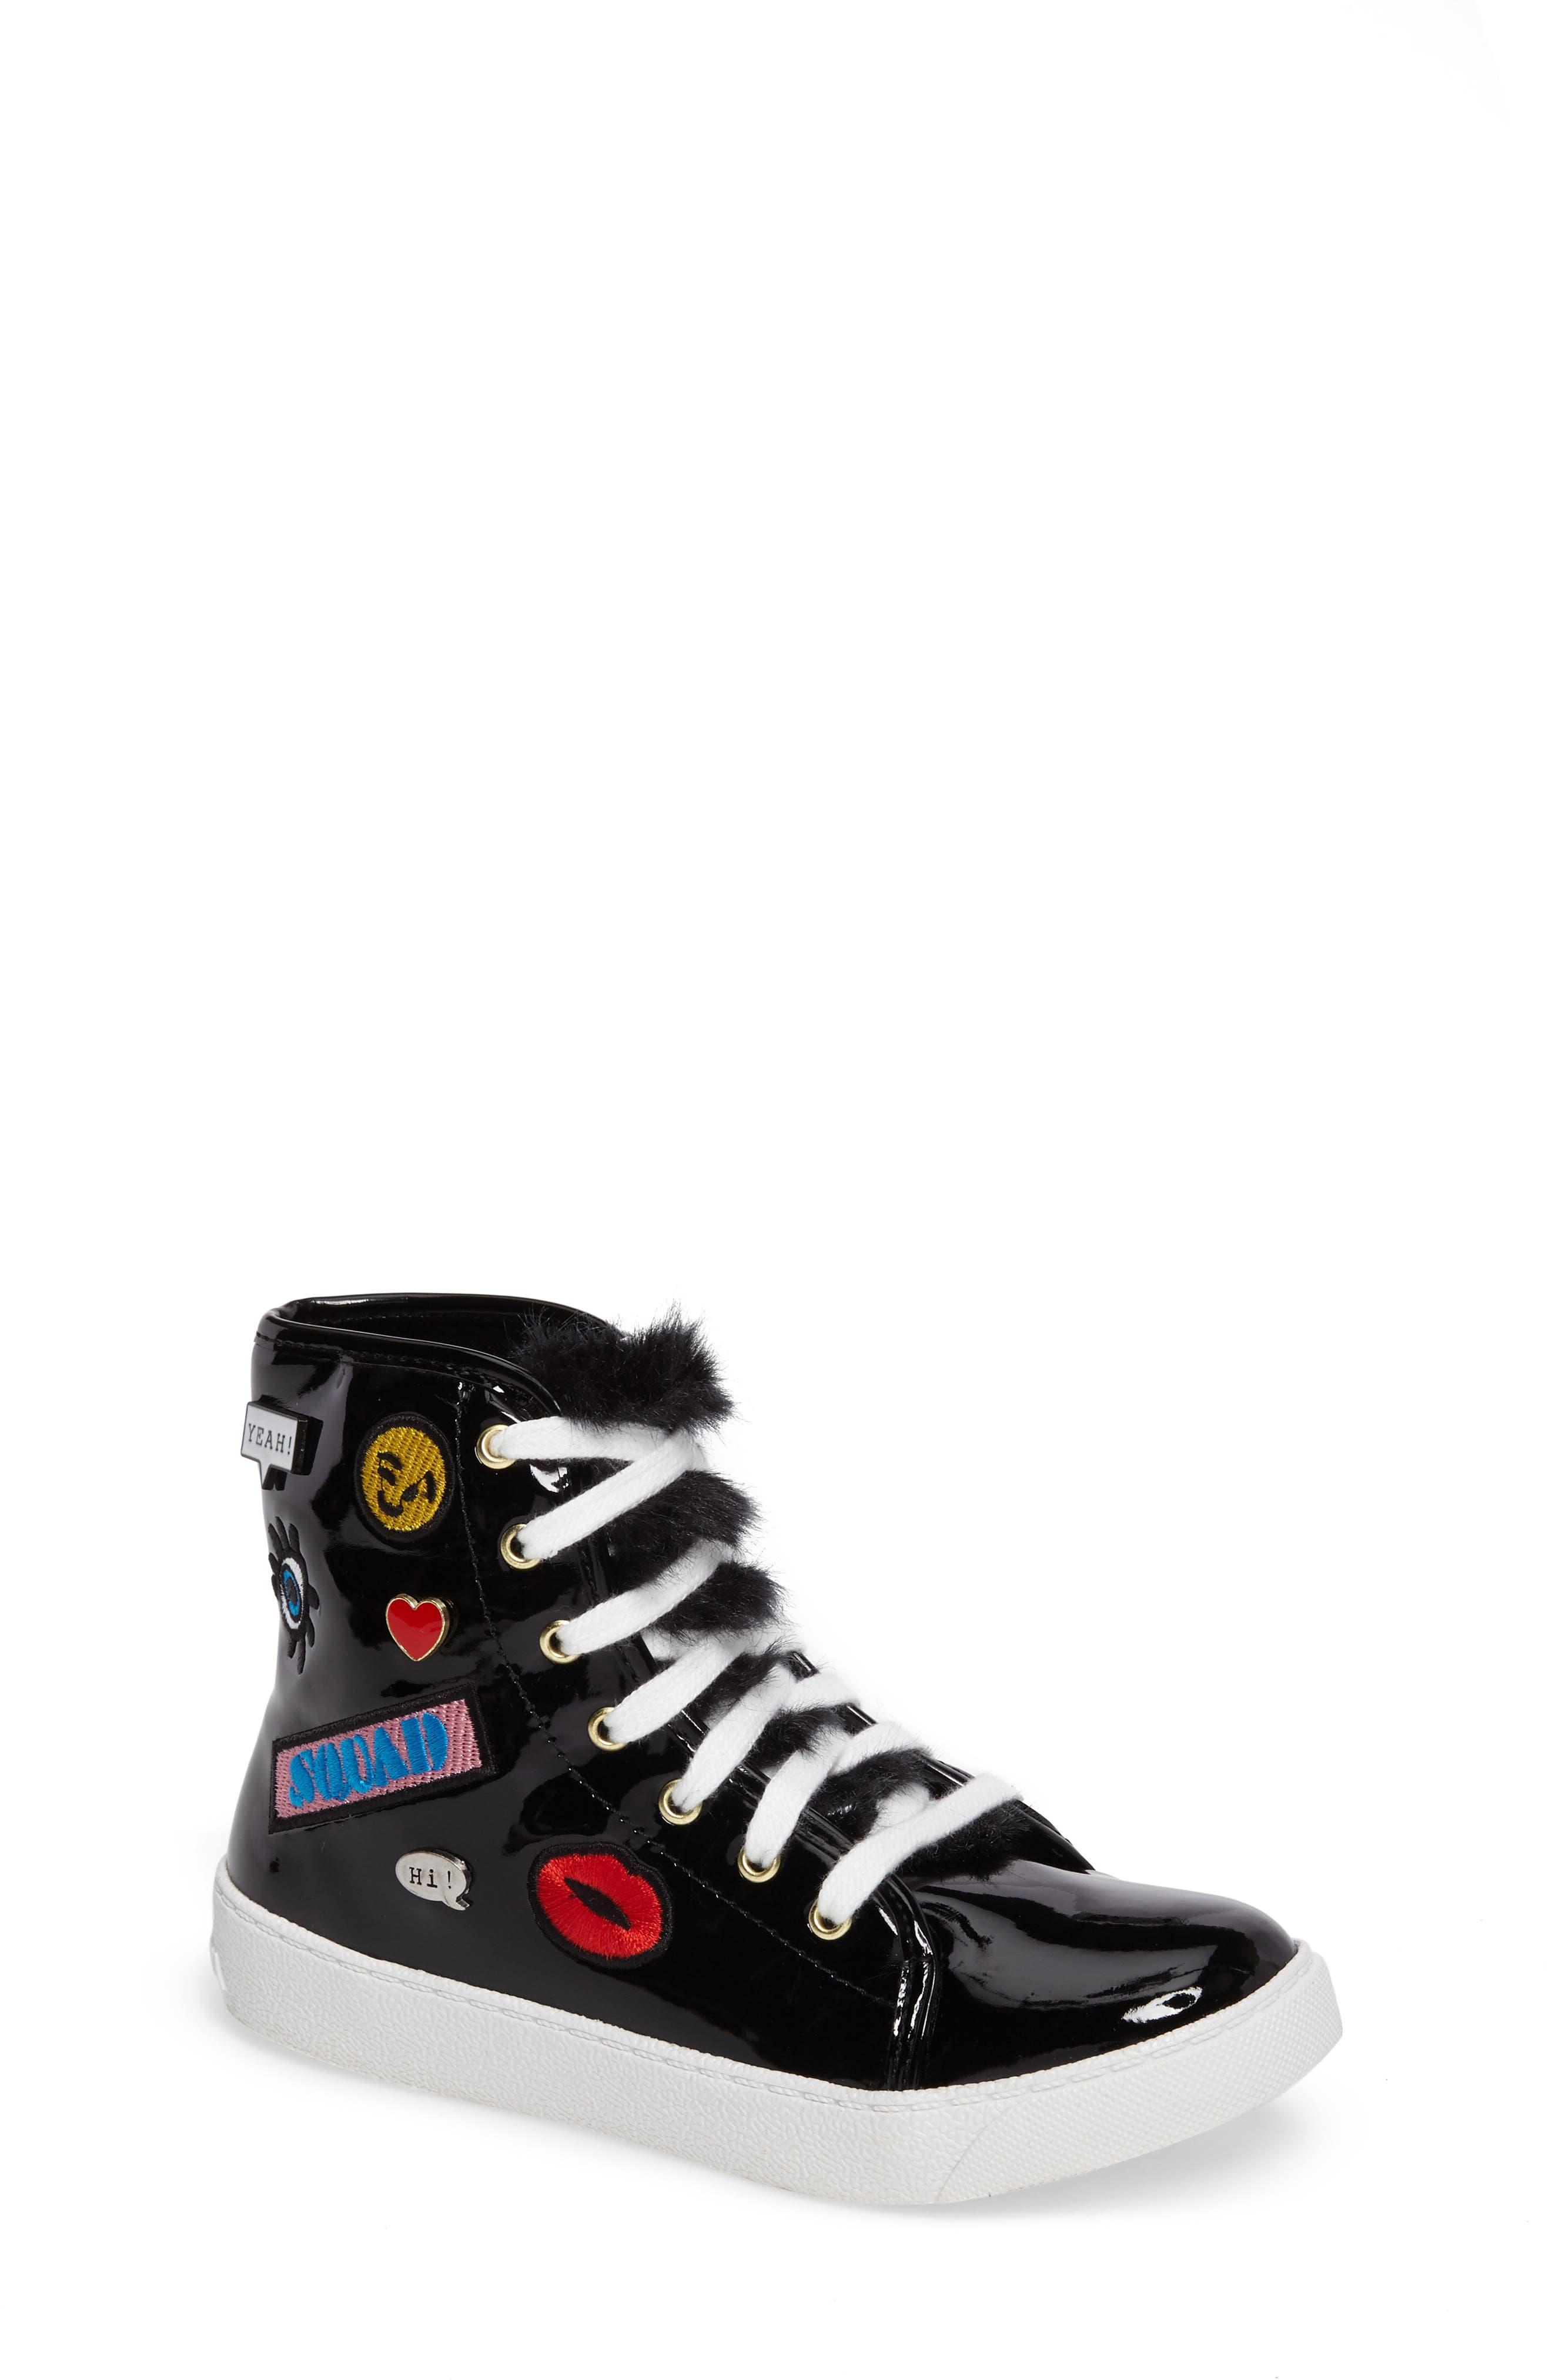 Alternate Image 1 Selected - Sam Edelman Harriet Heidi High-Top Sneaker (Toddler, Little Kid & Big Kid)